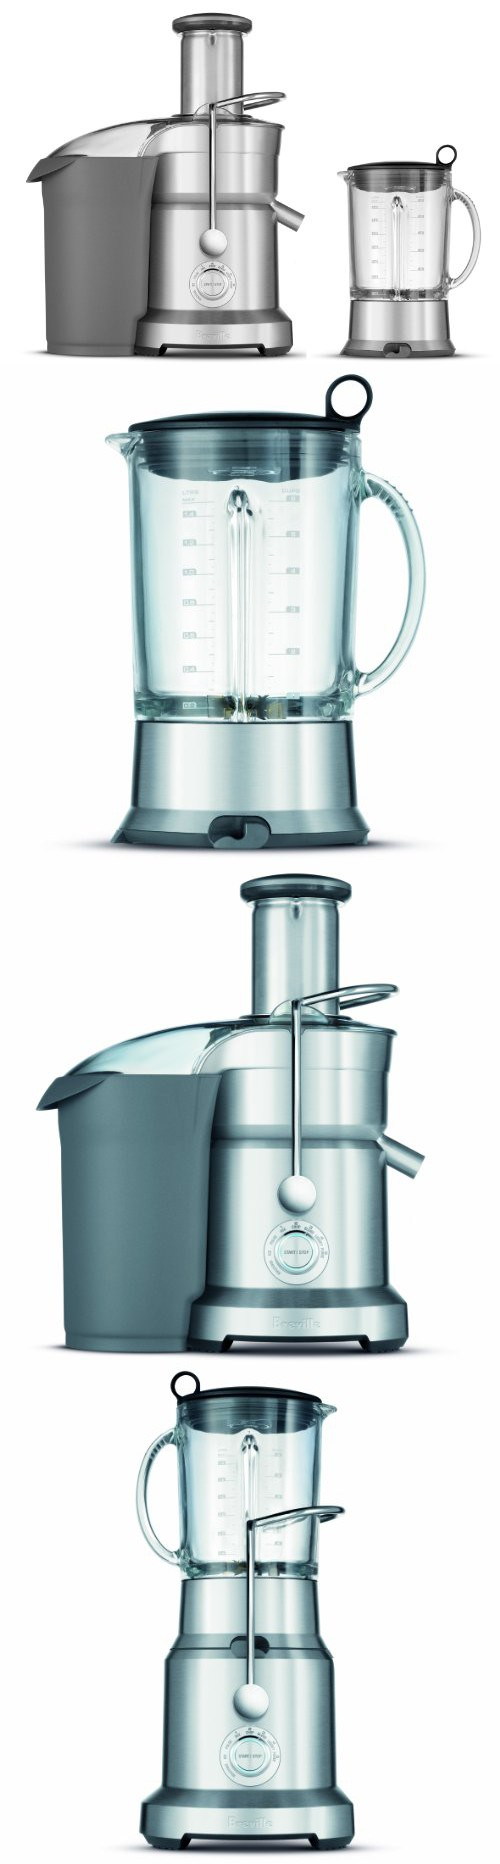 Breville BJB840XL Juice and Blend Dual-Purpose Juicer and Blender ...